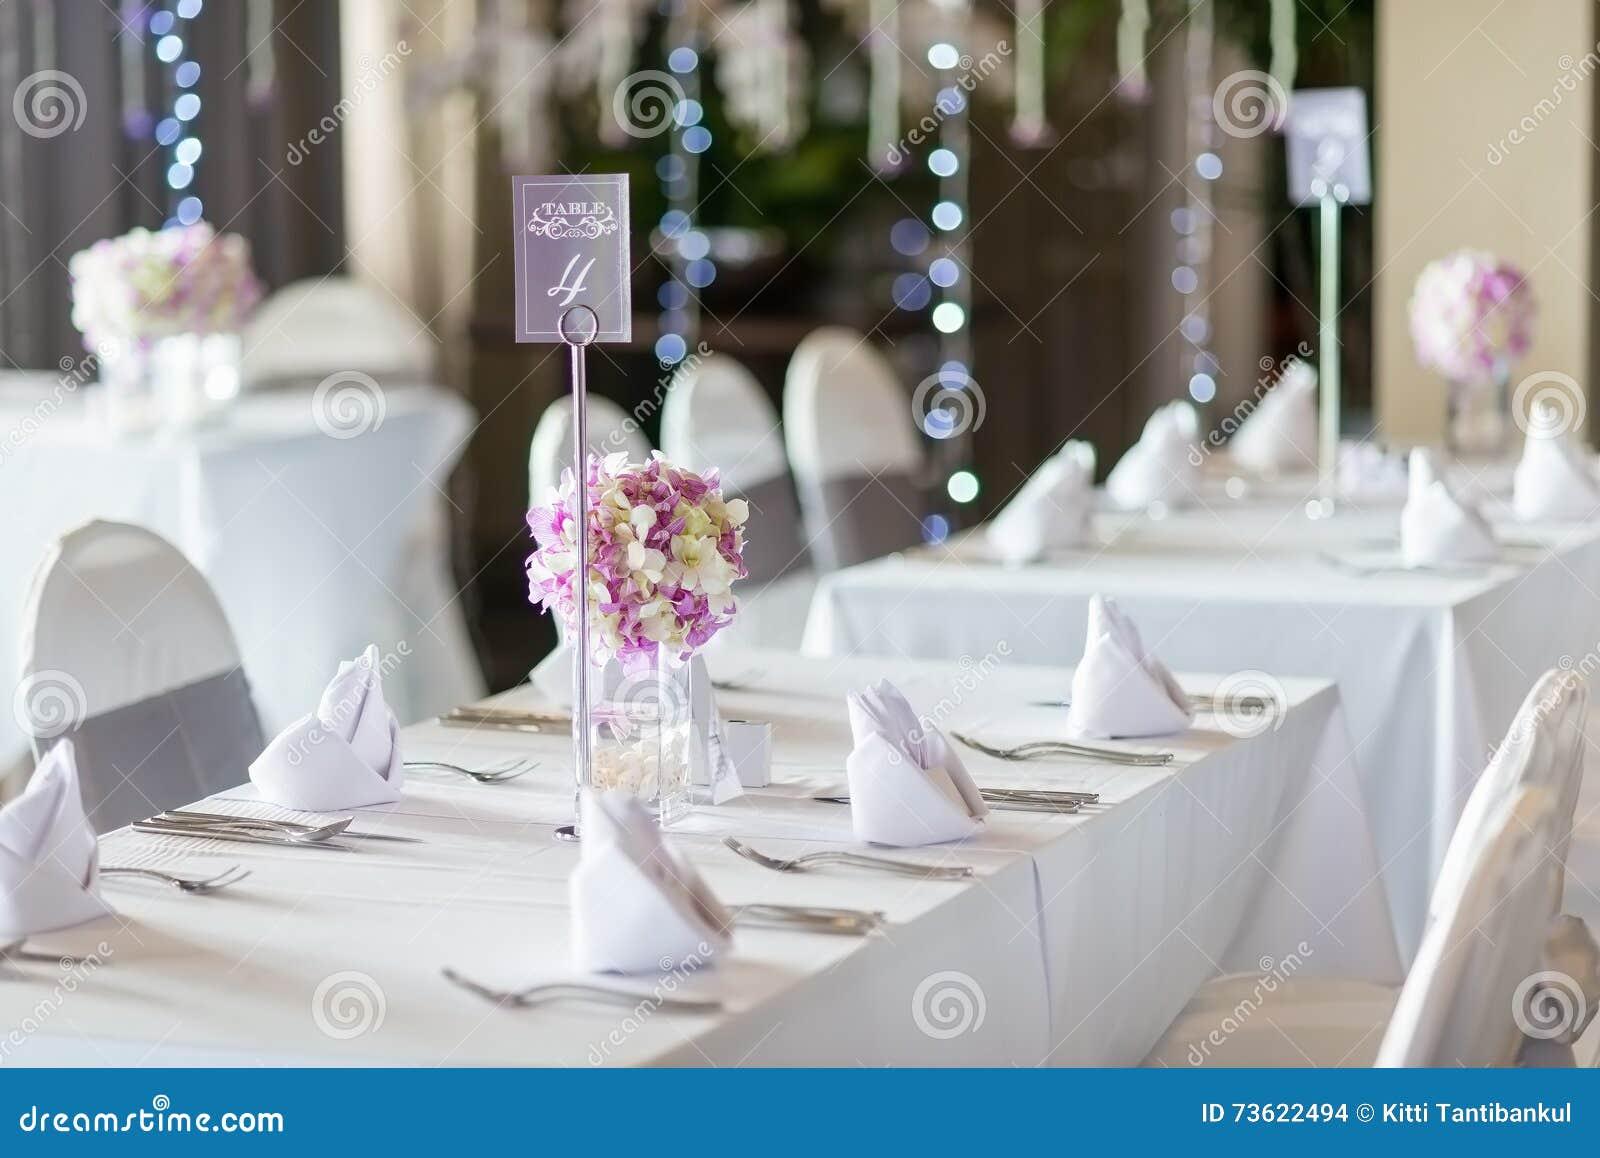 Dinner Table Background dinner table setup stock photo - image: 73622494